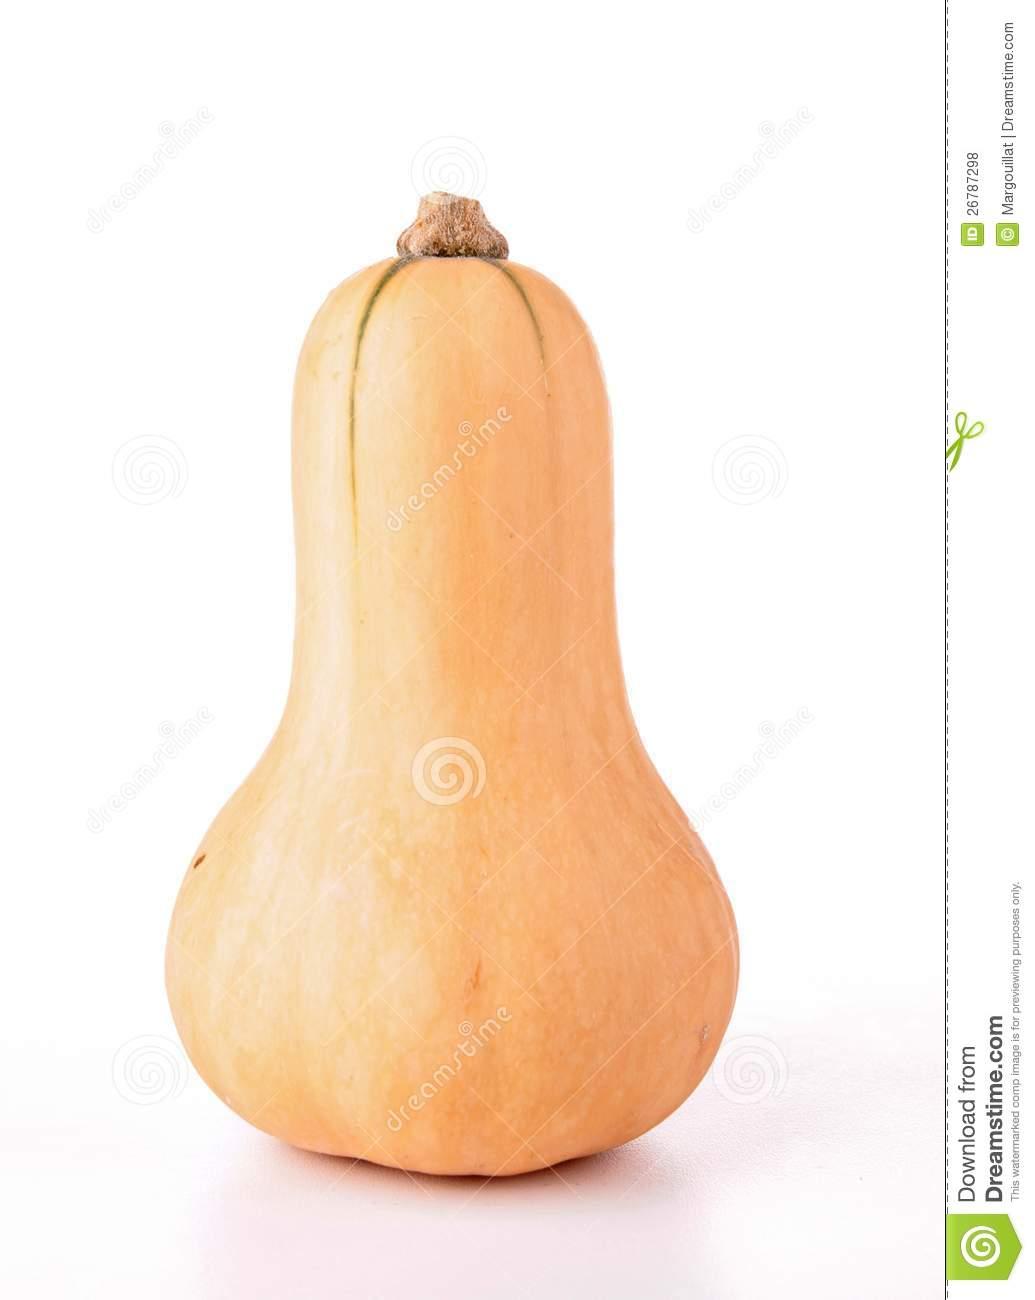 Gourd clipart squash Squash Images Clipart squash%20clipart Free